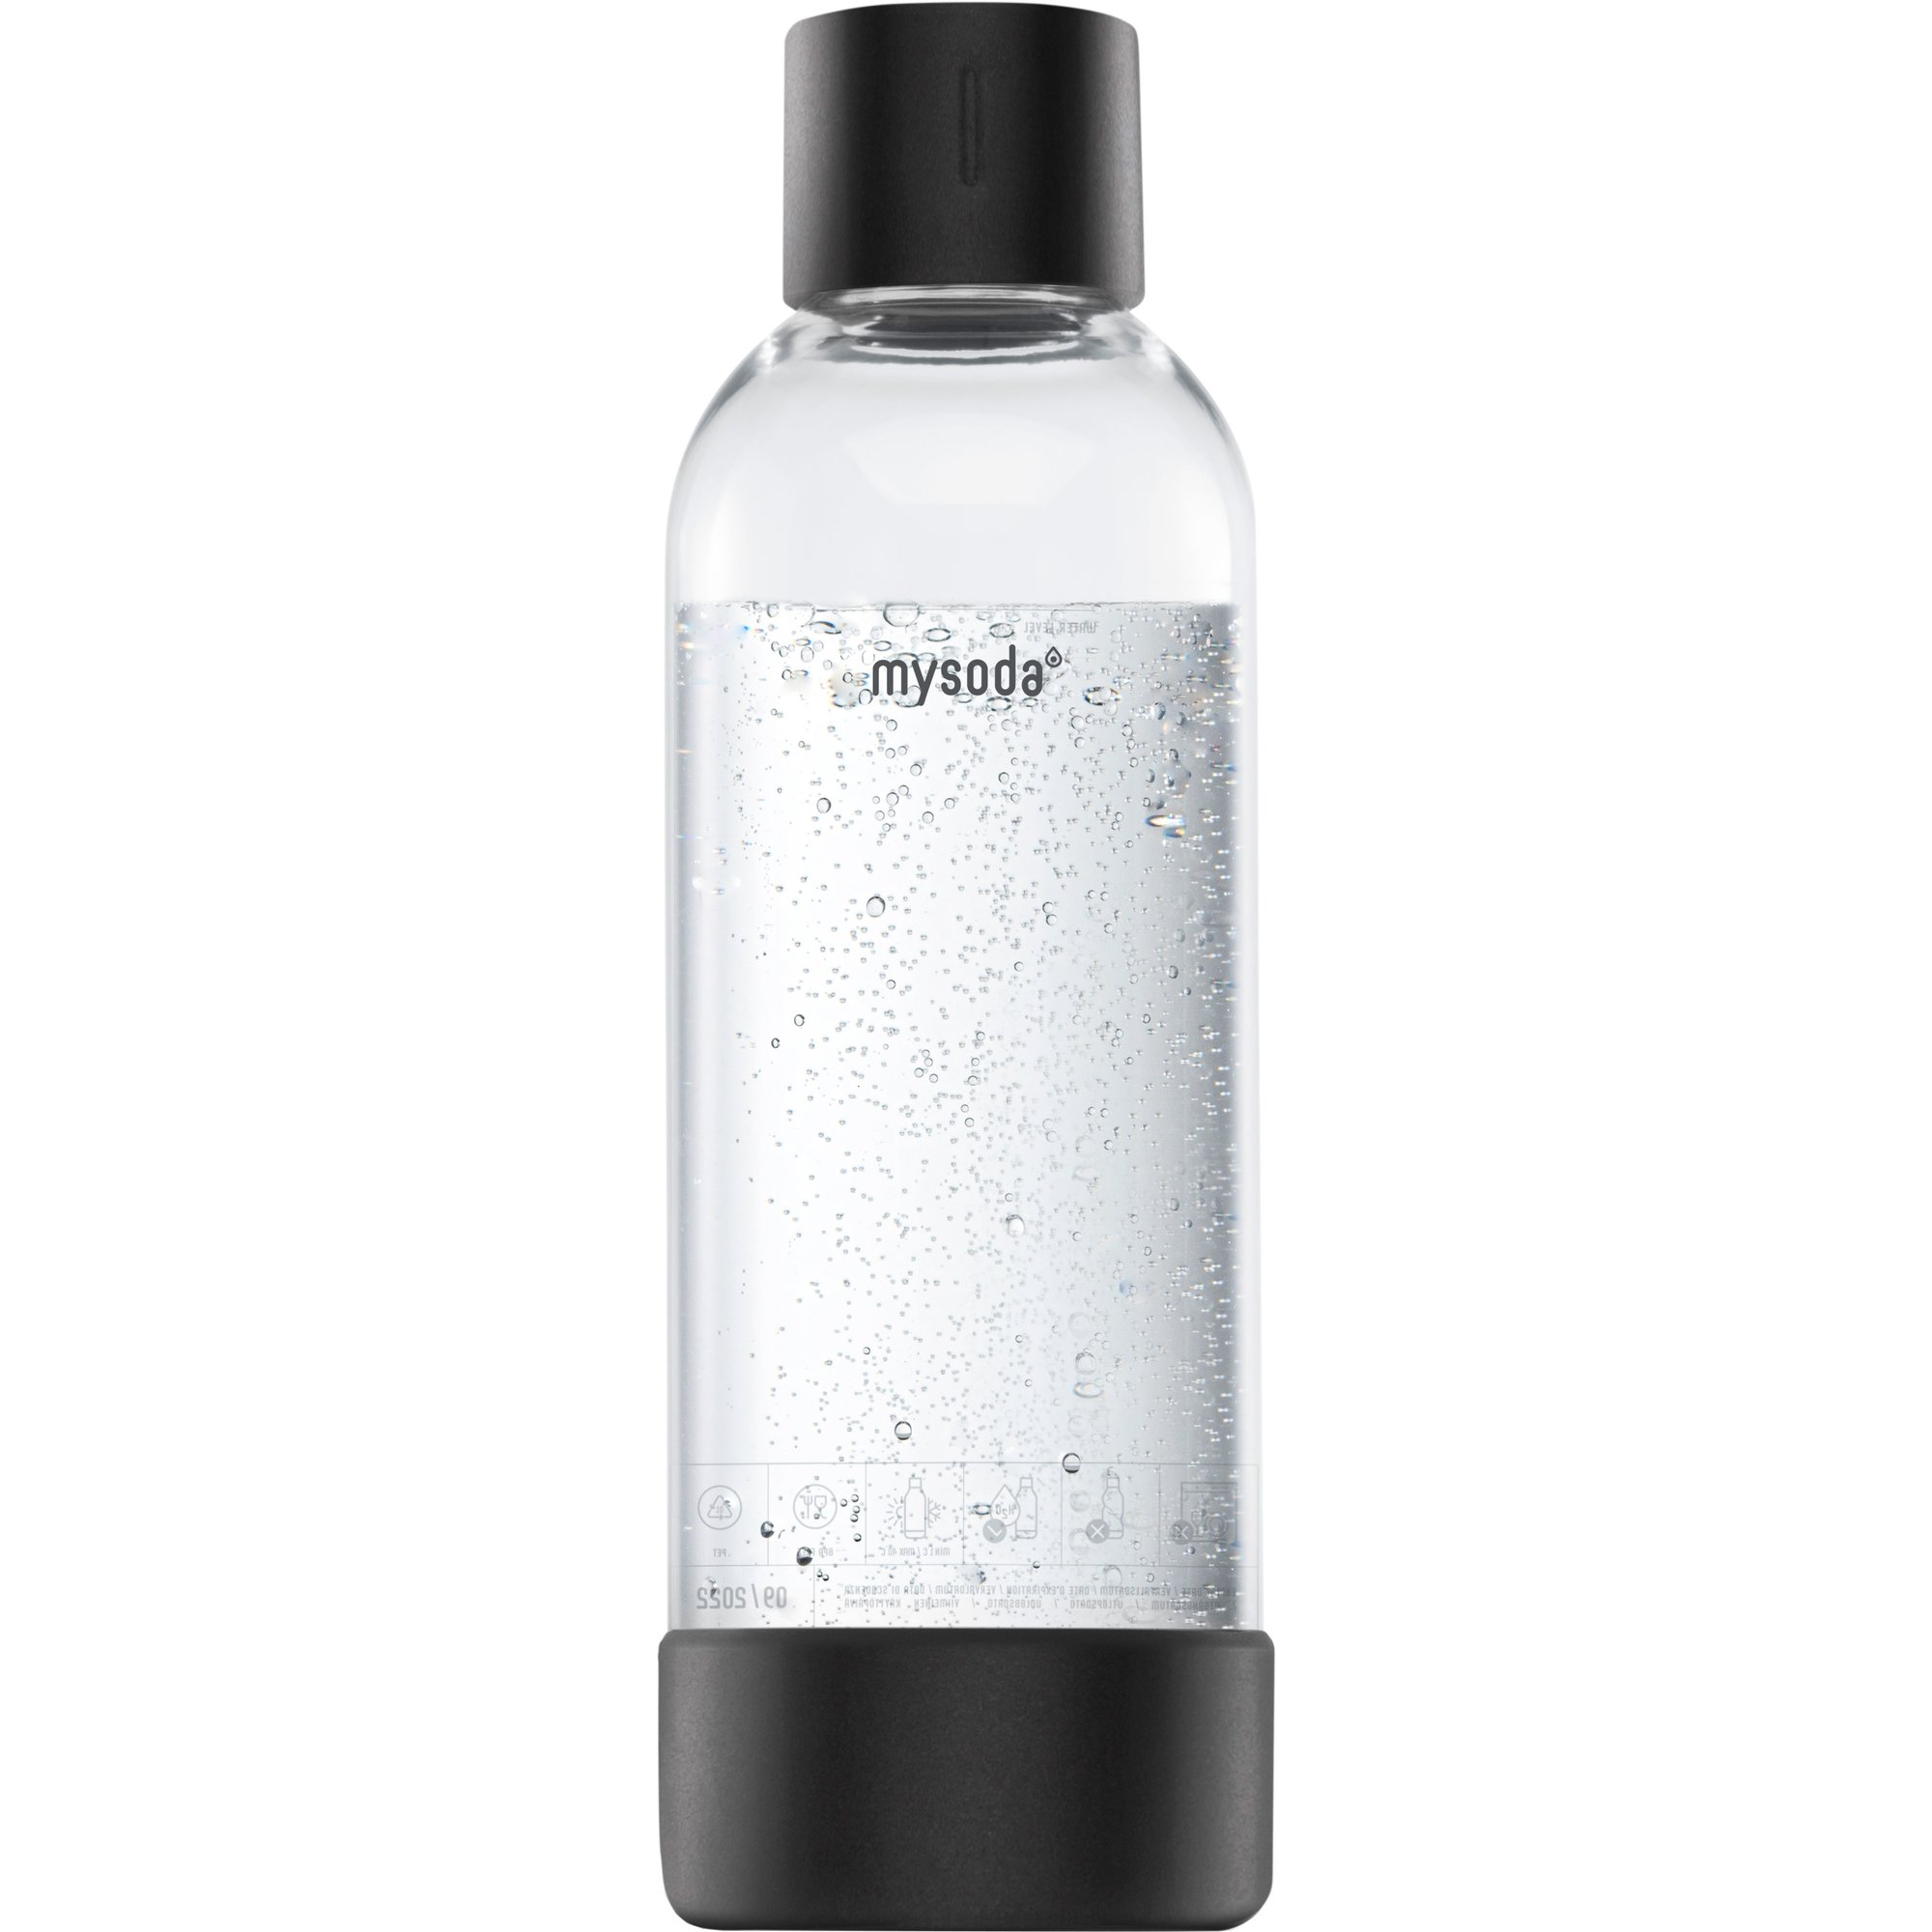 MySoda Vattenflaska 1 liter, Svart